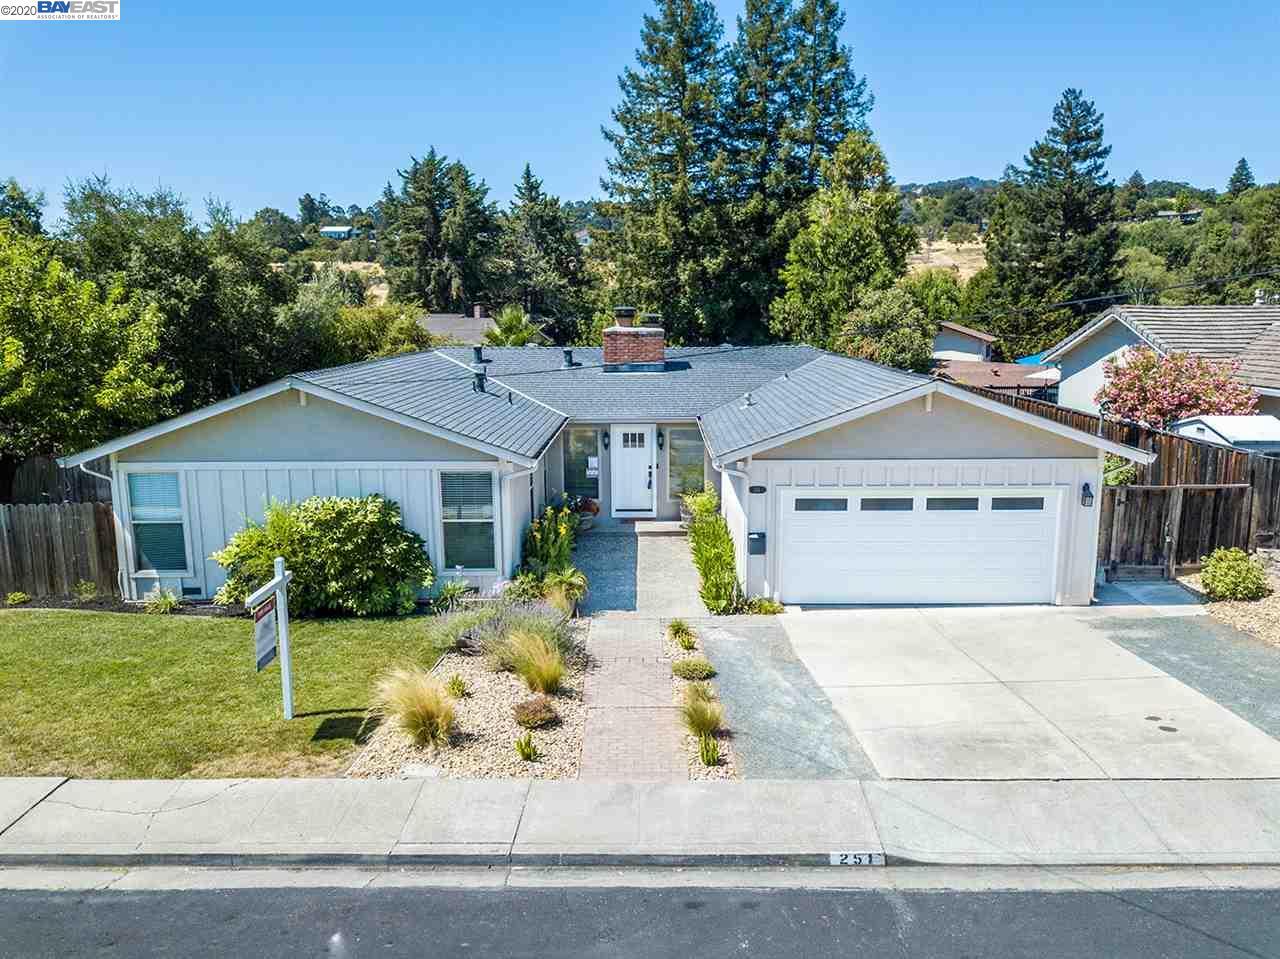 251 Donegal Way Martinez, CA 94553